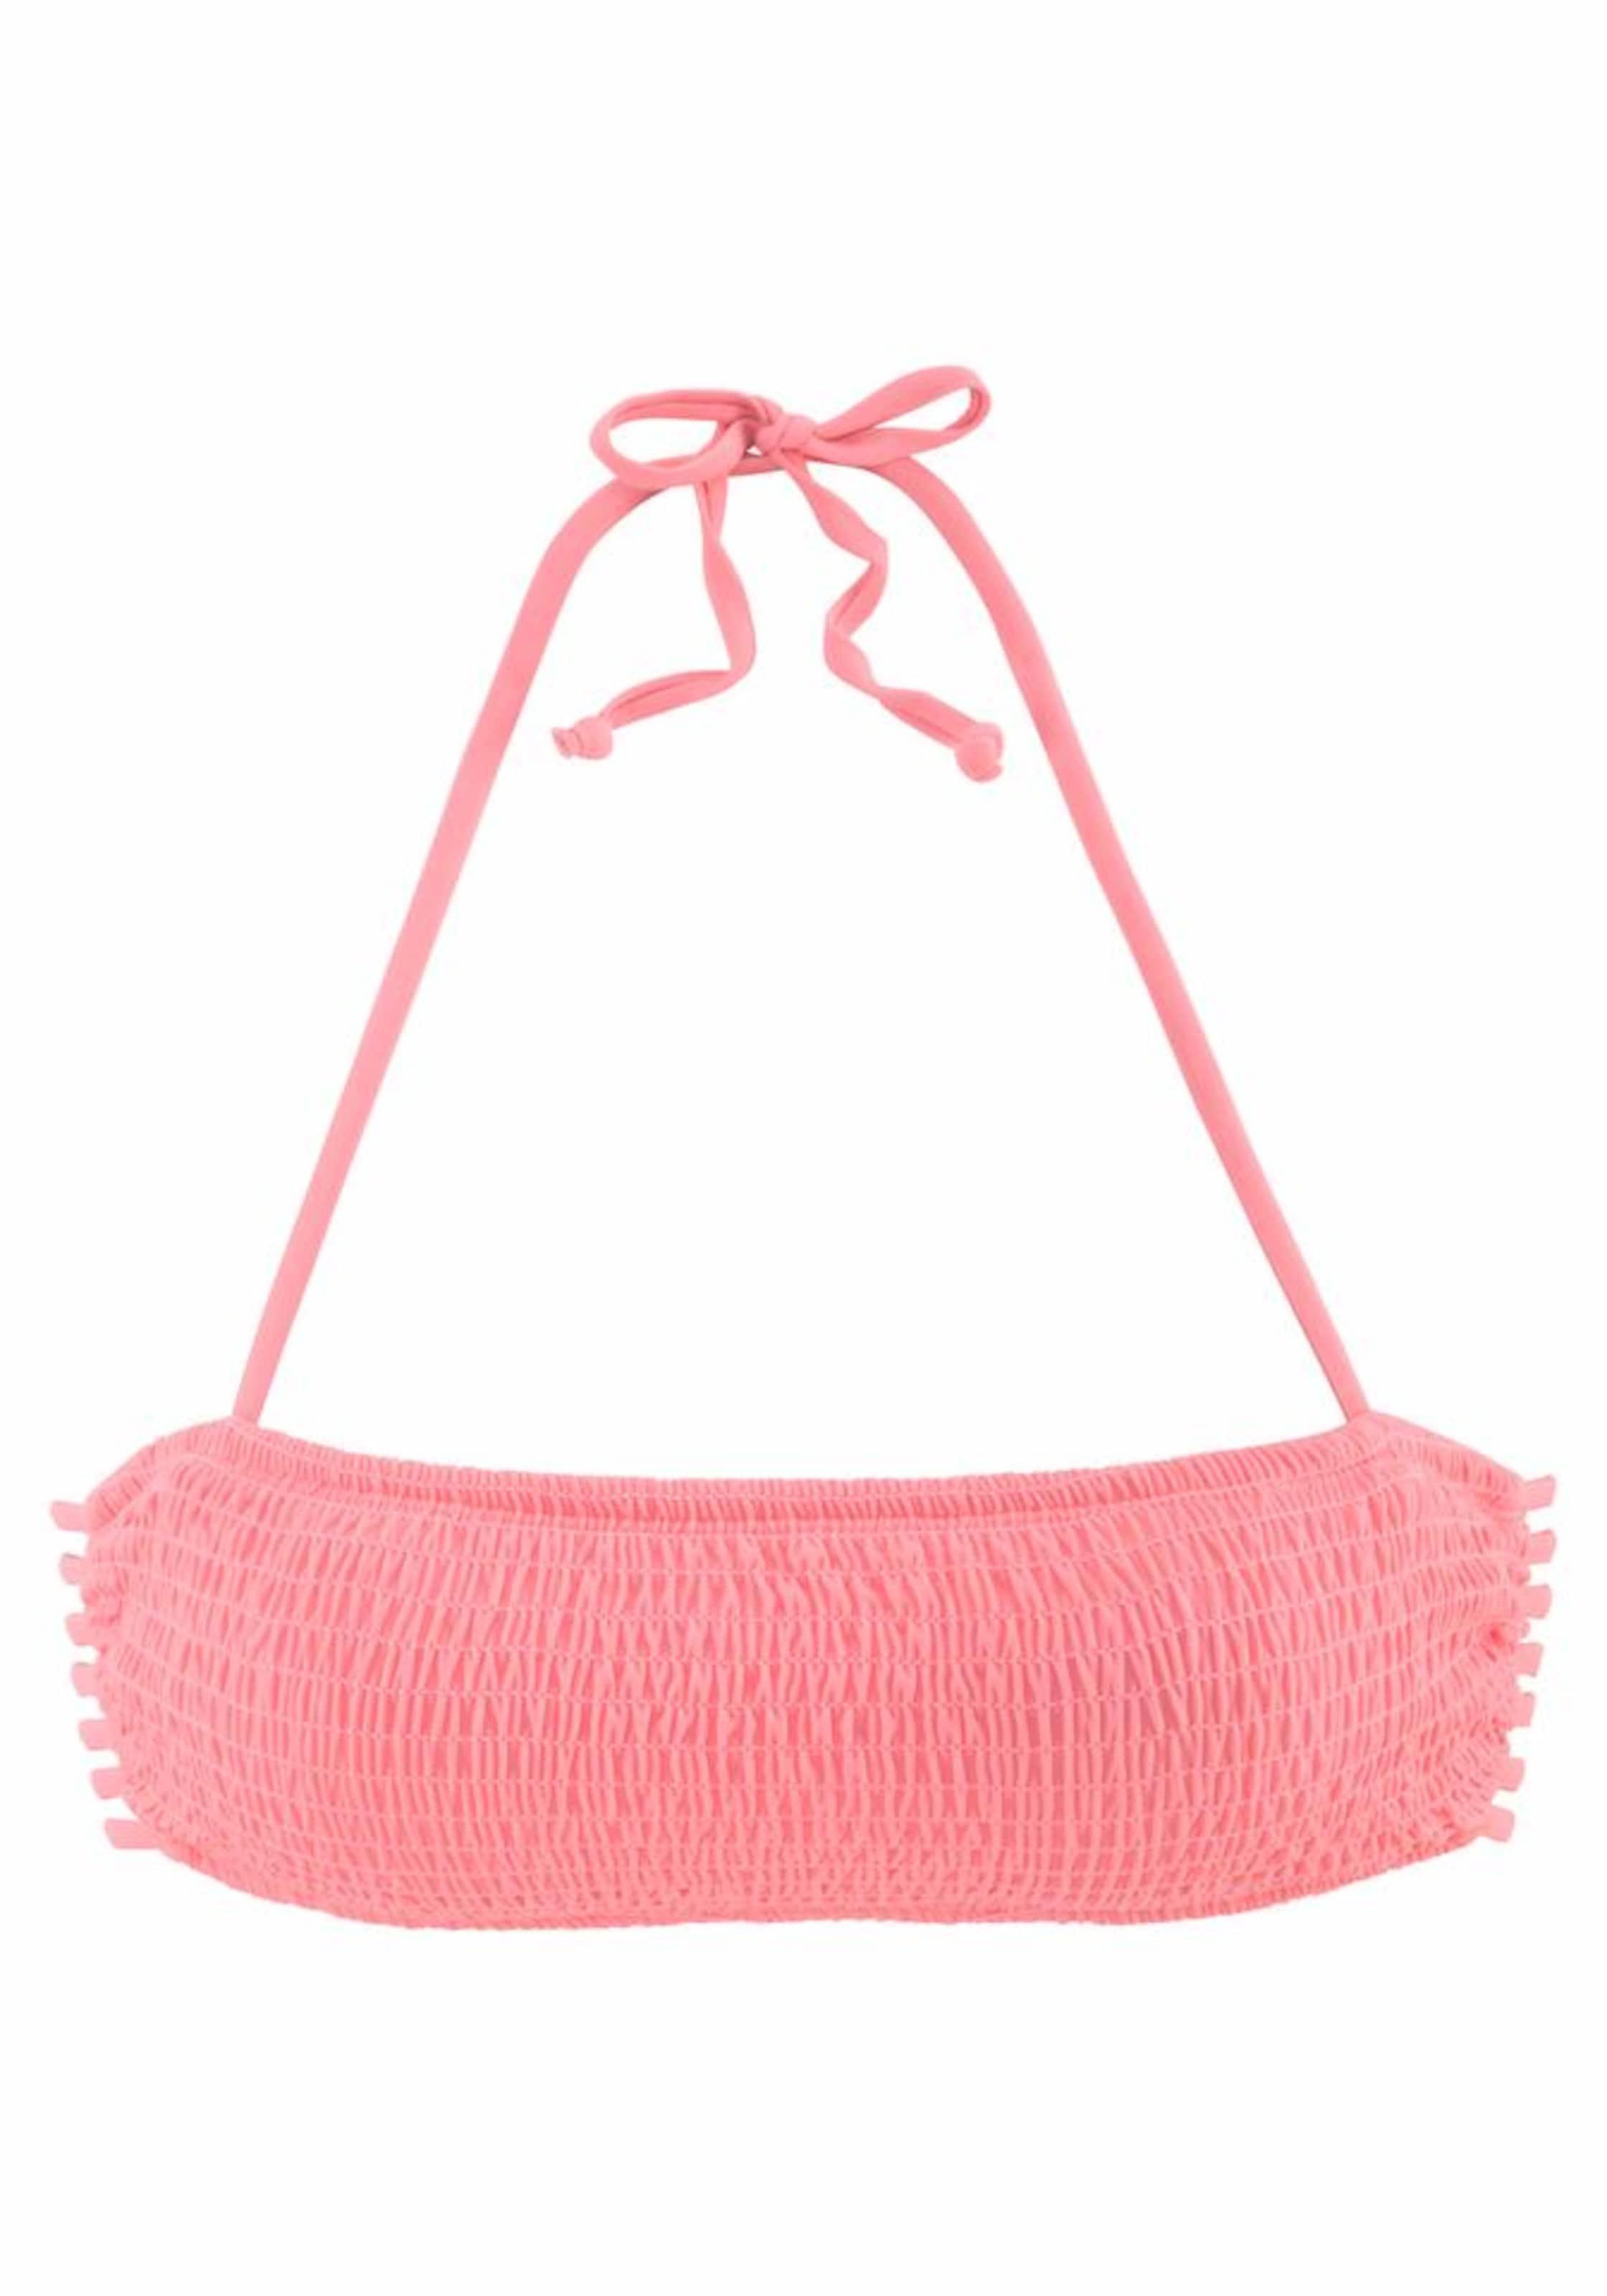 'kuba' Beach Top In Rosé Homeboy 7gvmIYf6by